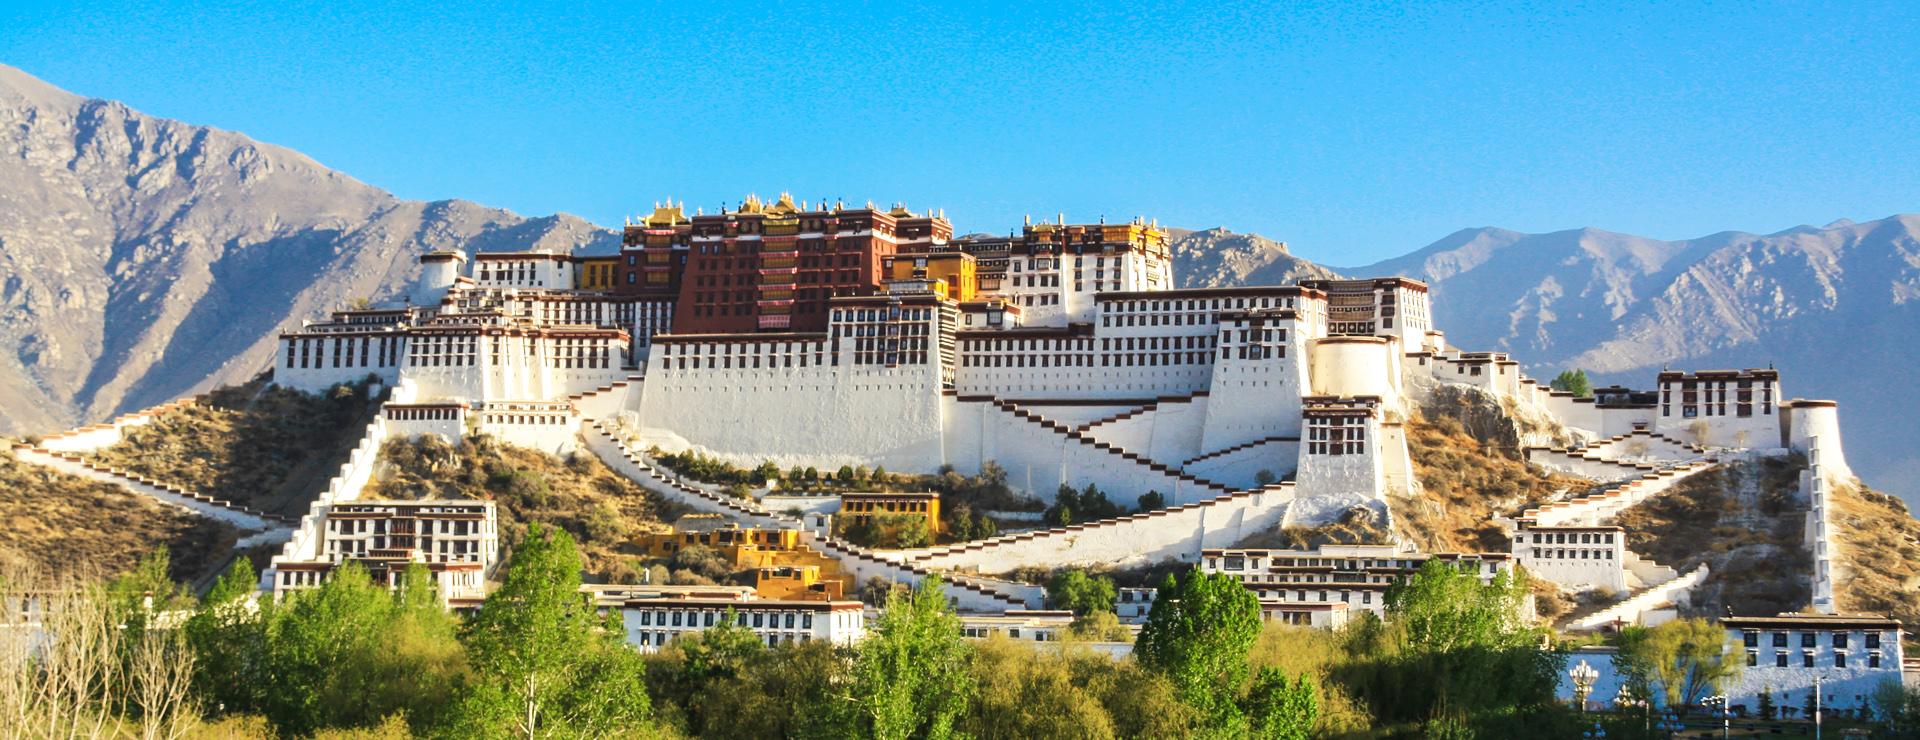 Tibet – Potalapalatset